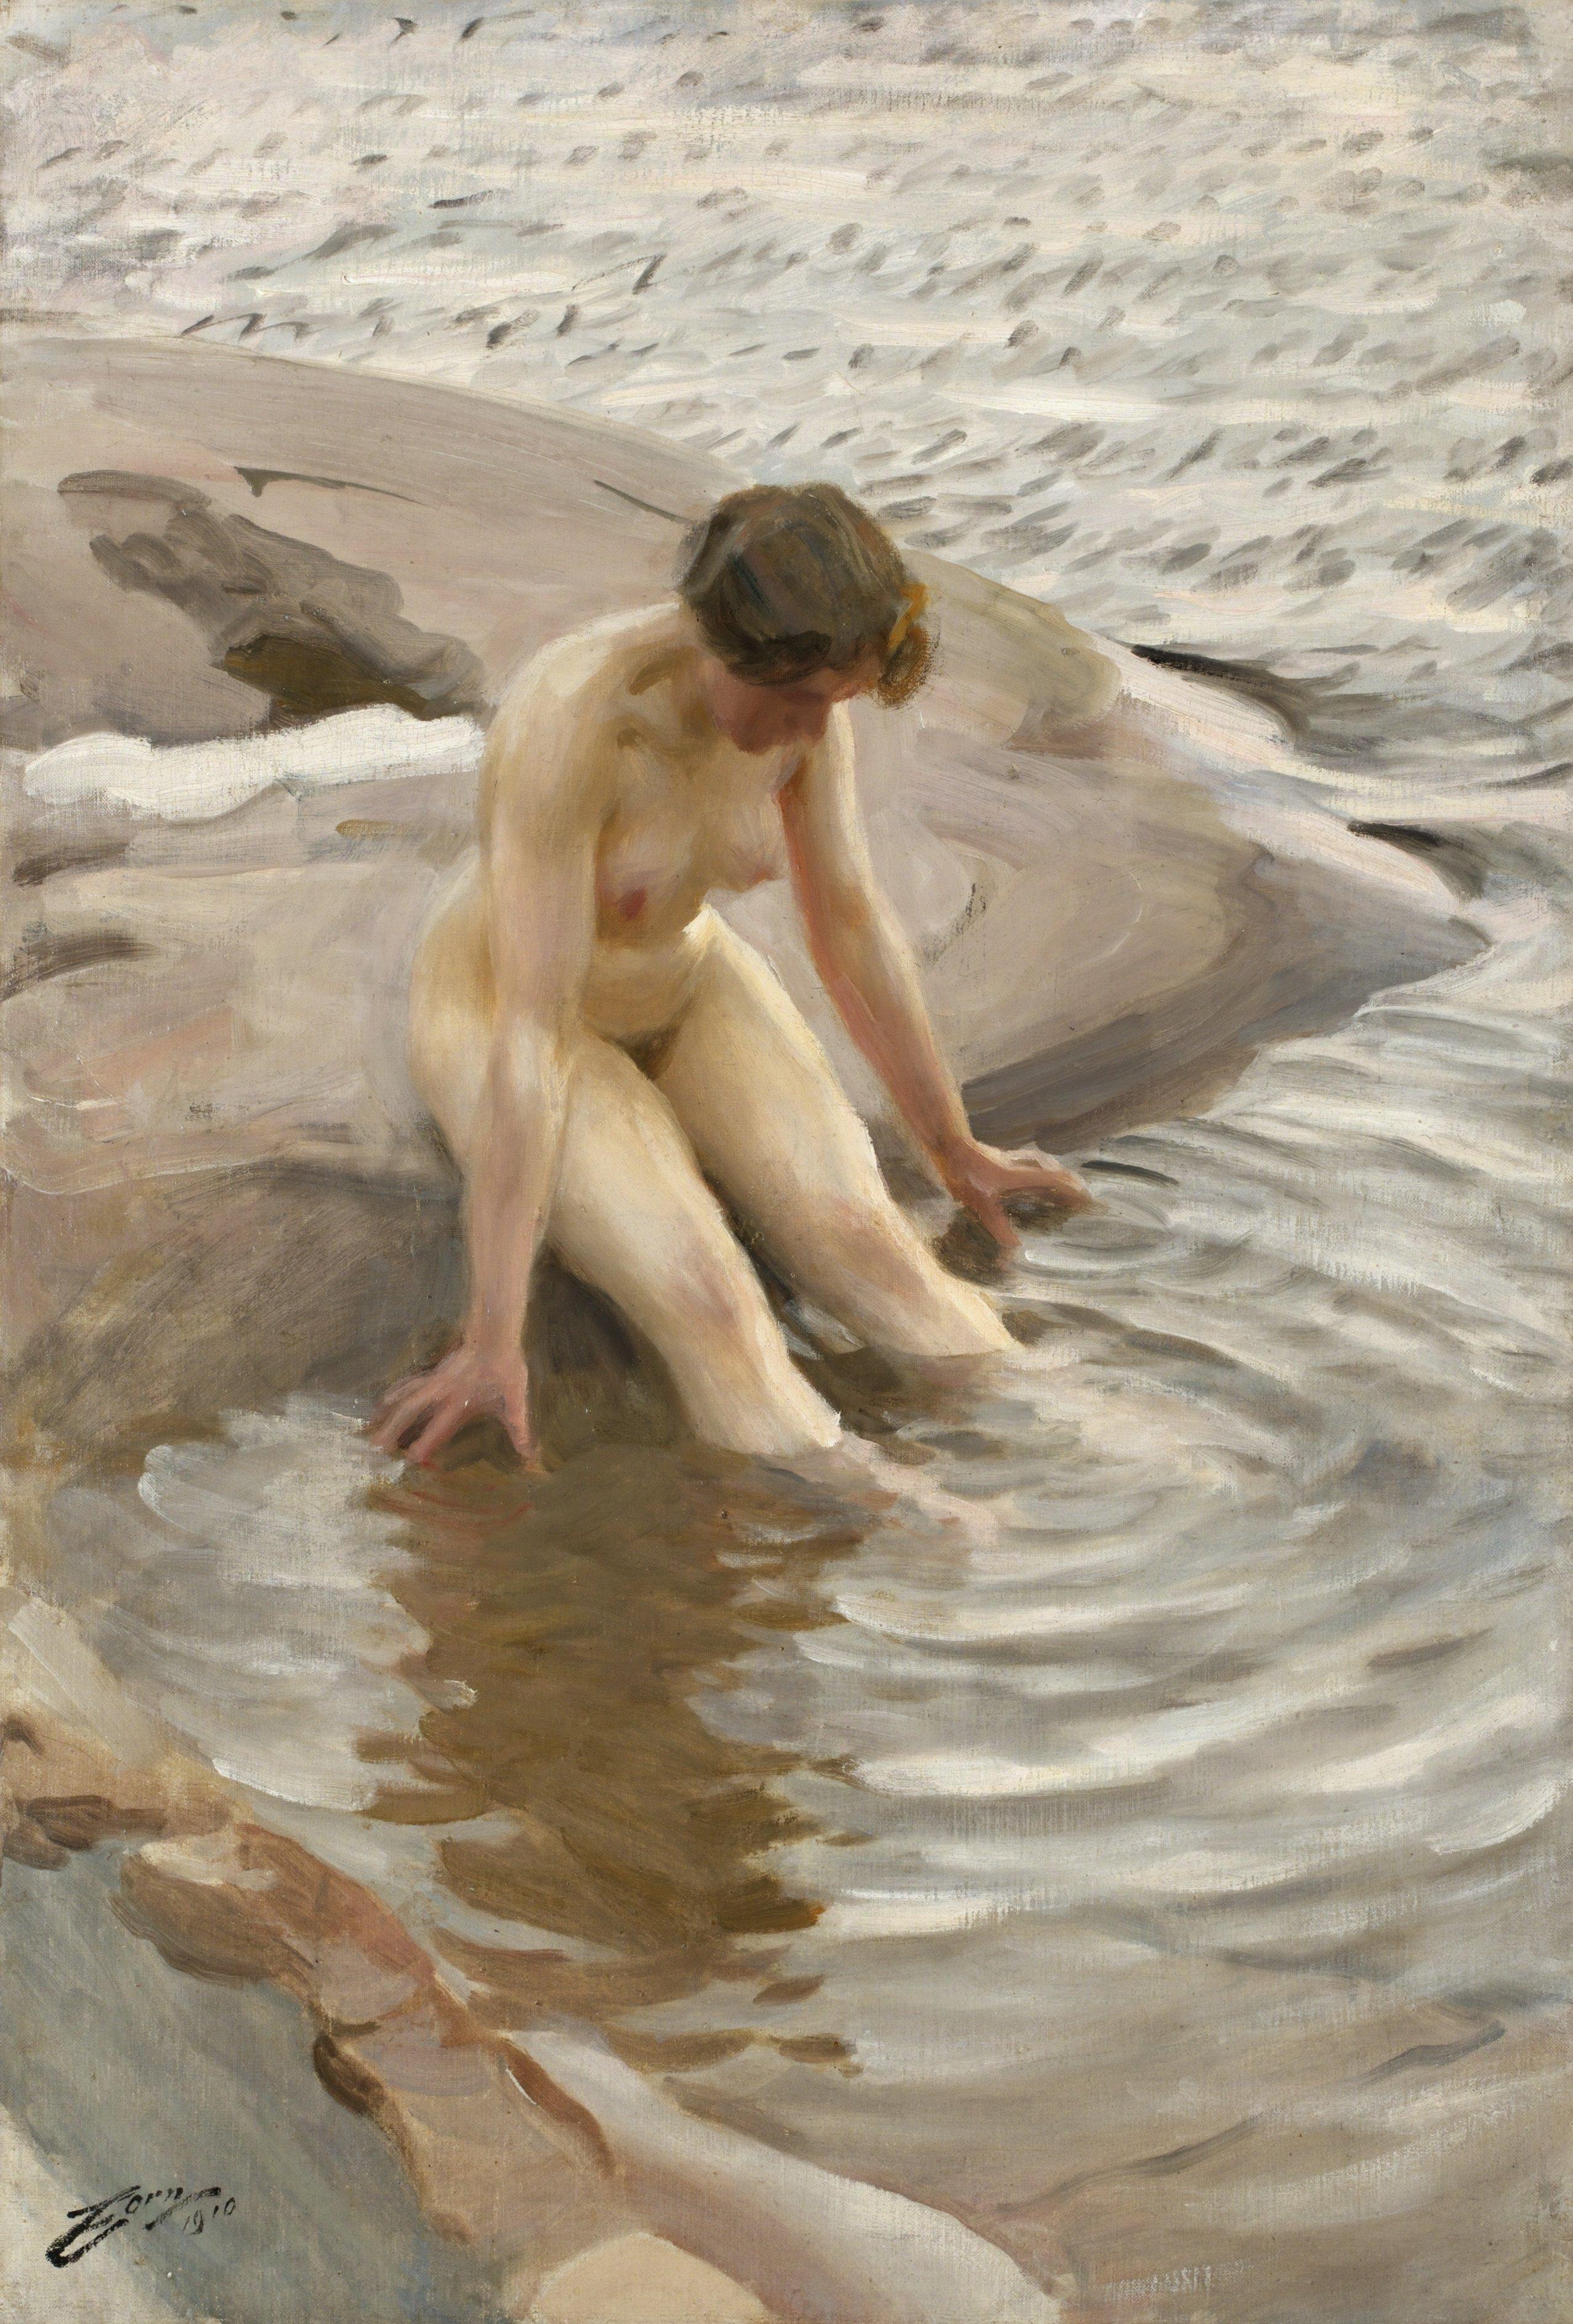 Anders Zorn, Vått (1910)